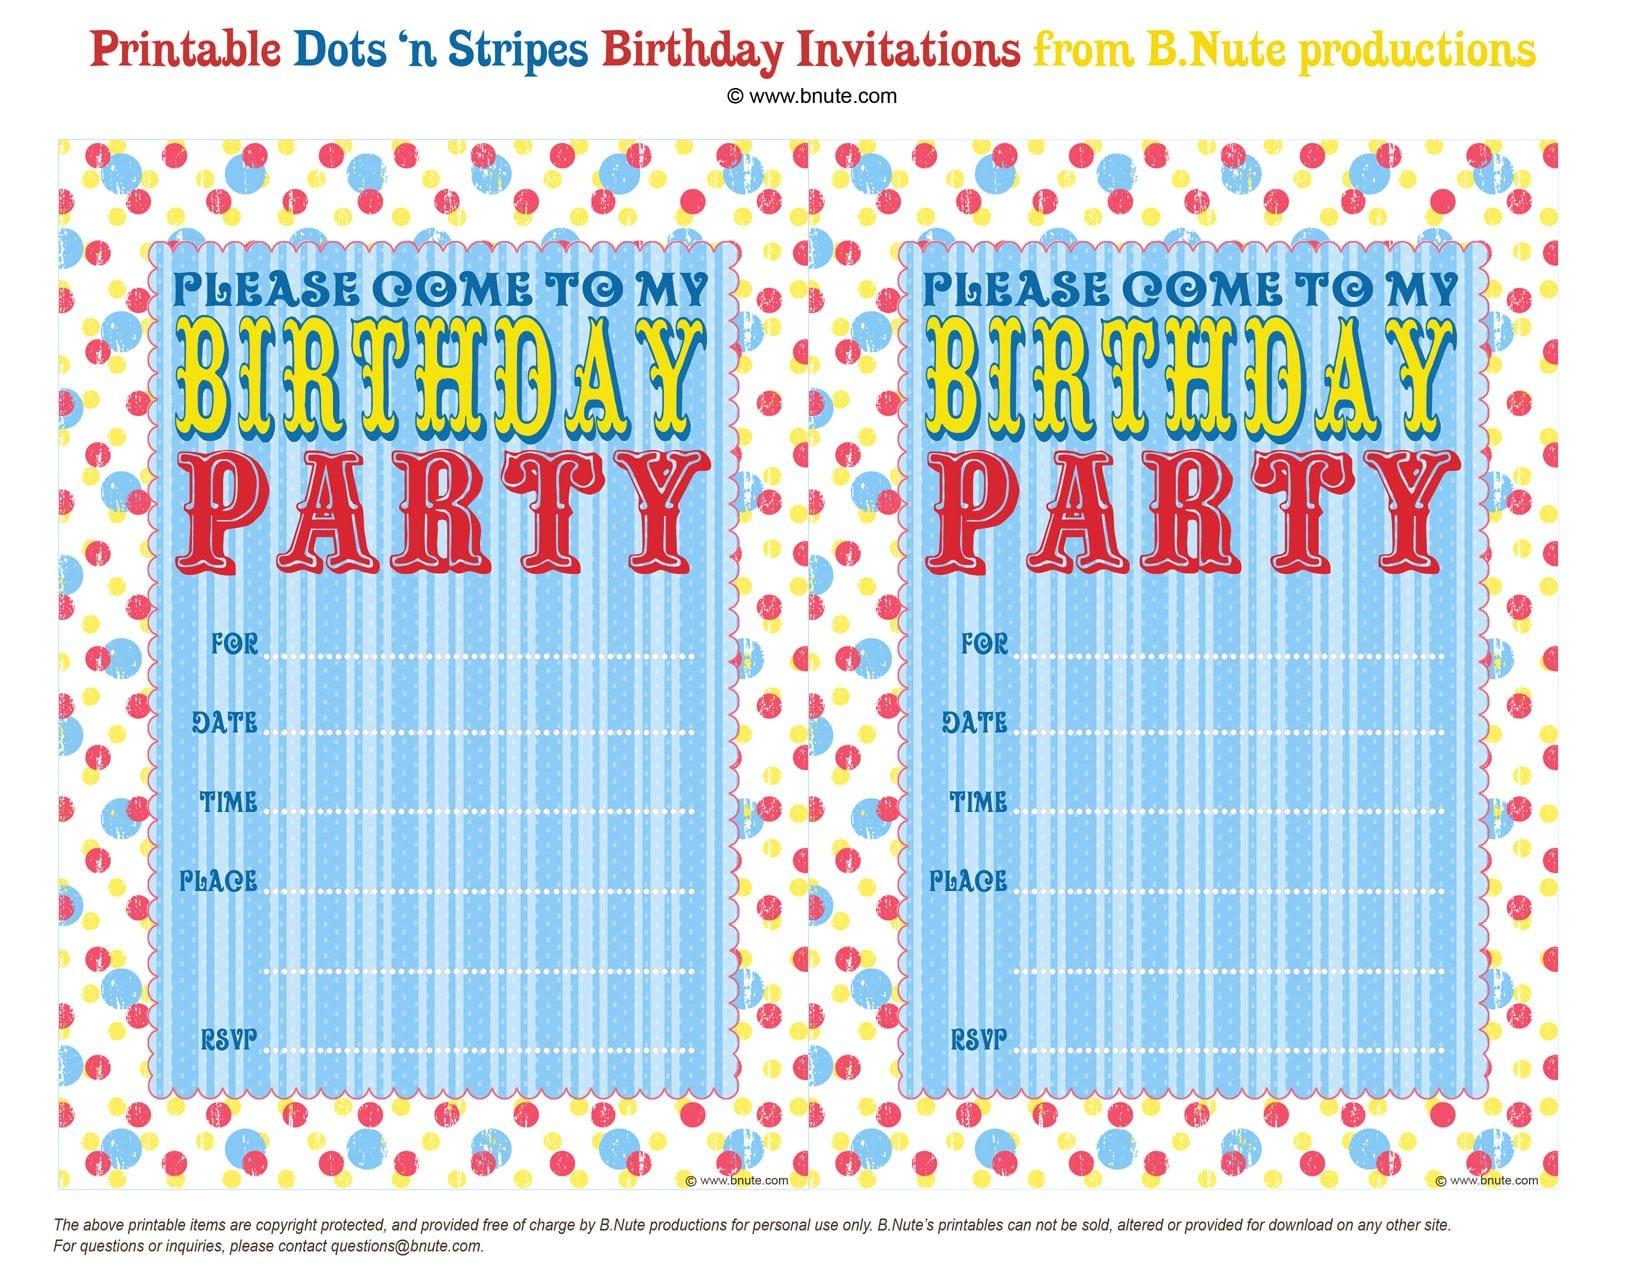 Birthday Party Invitation Prinout